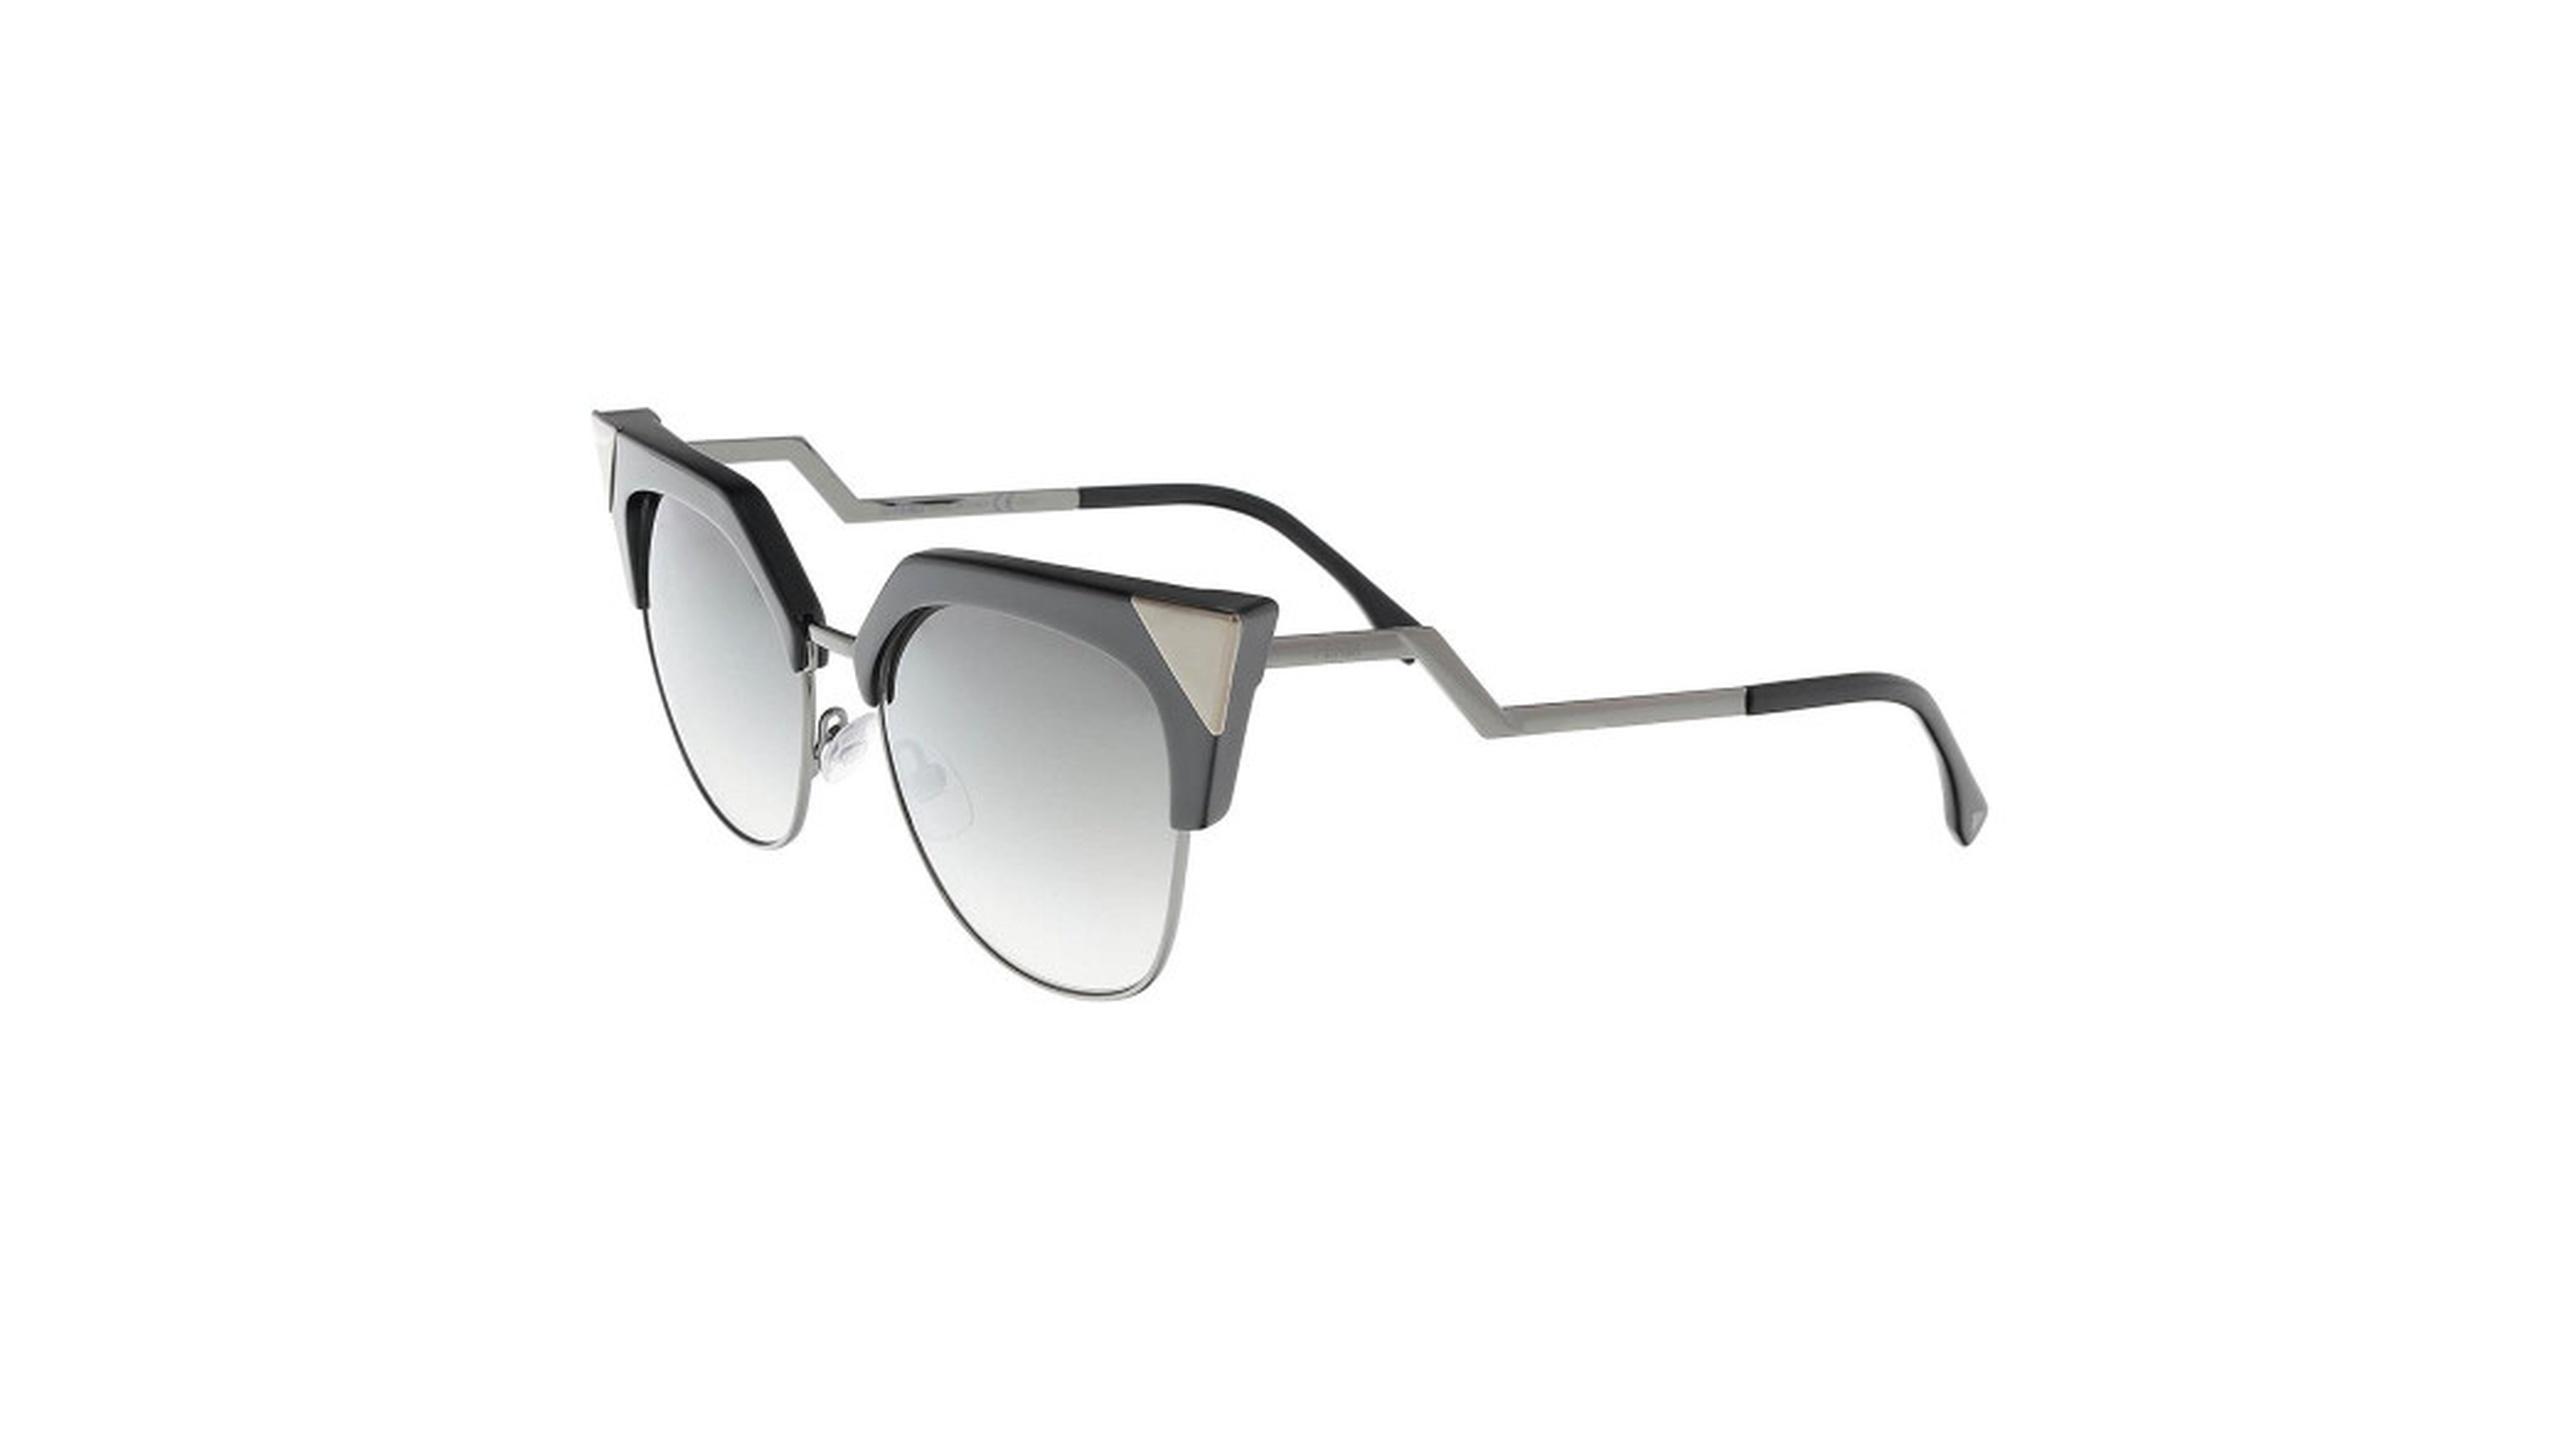 3bb5a87d344f Fendi Ff 0149 S 0kkl Iridia Black Ruthenium Cateye Sunglasses